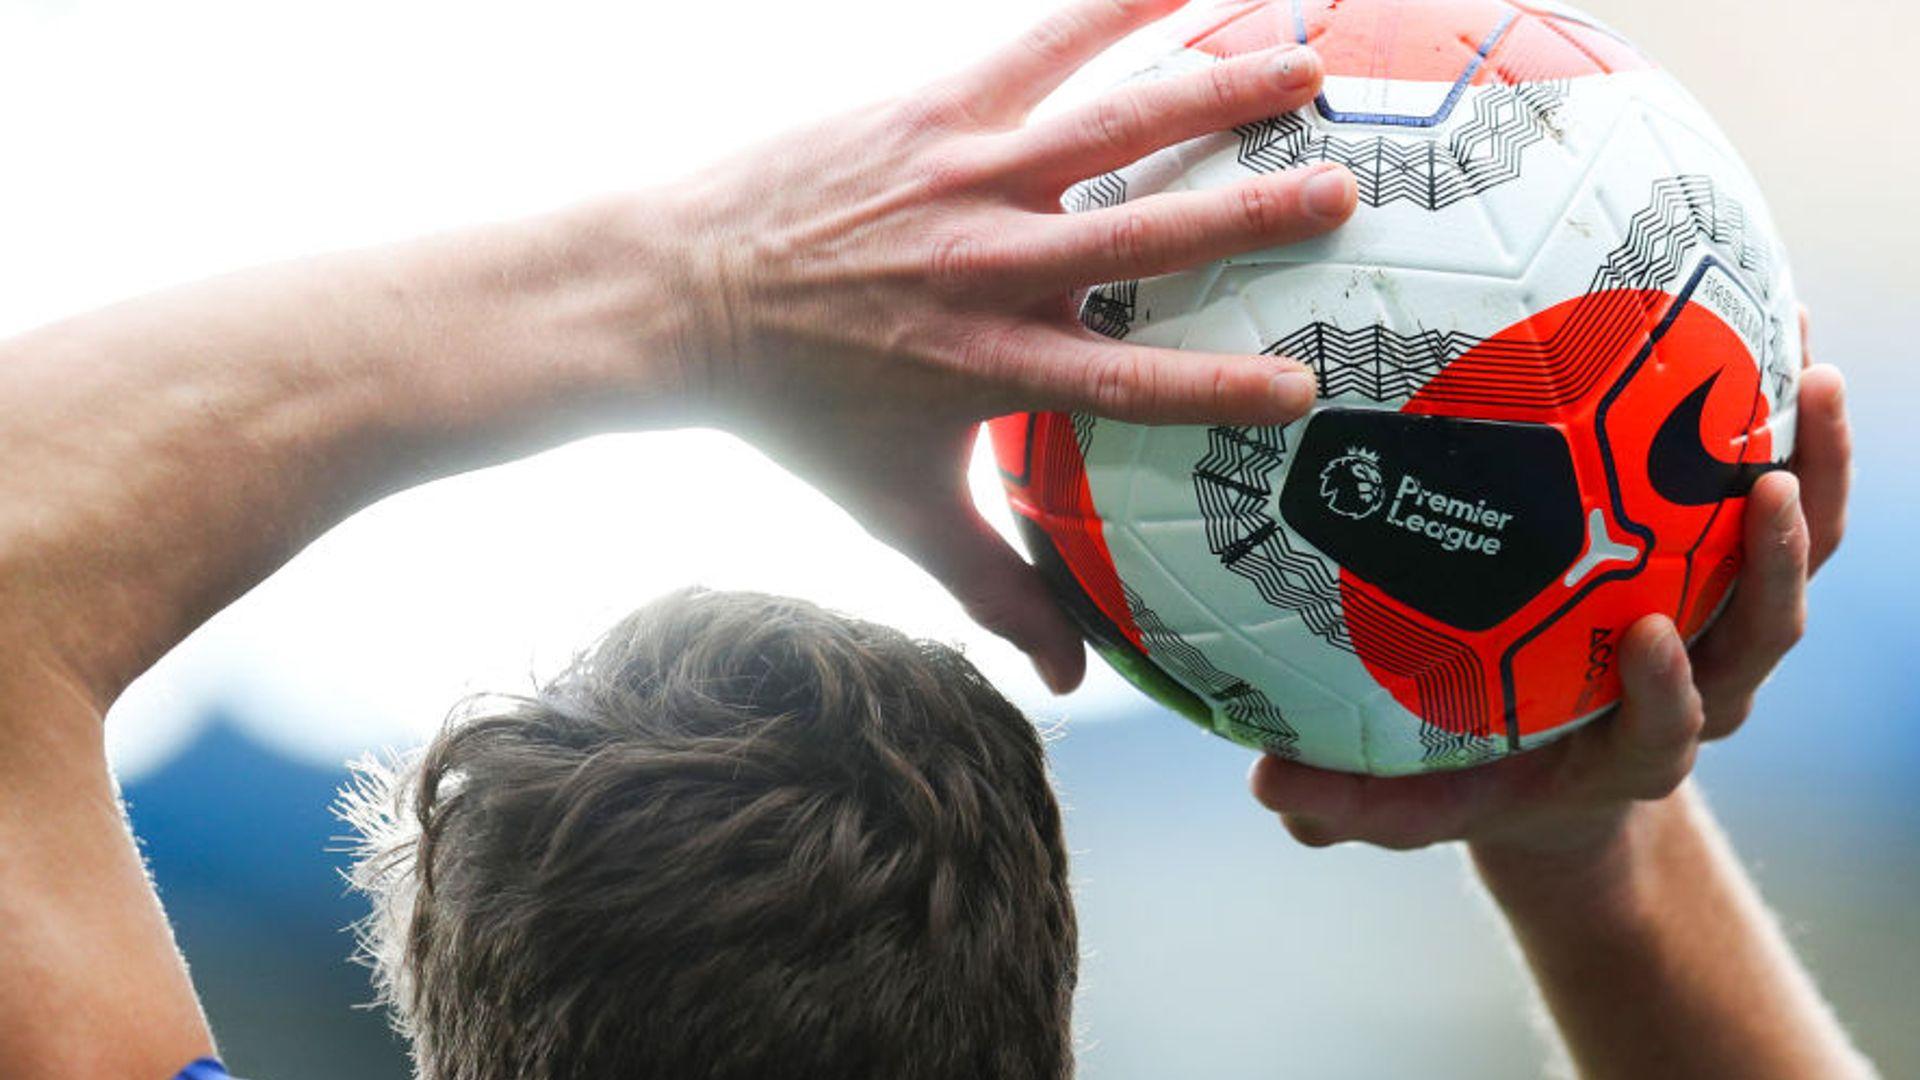 Premier League to allow five substitutions